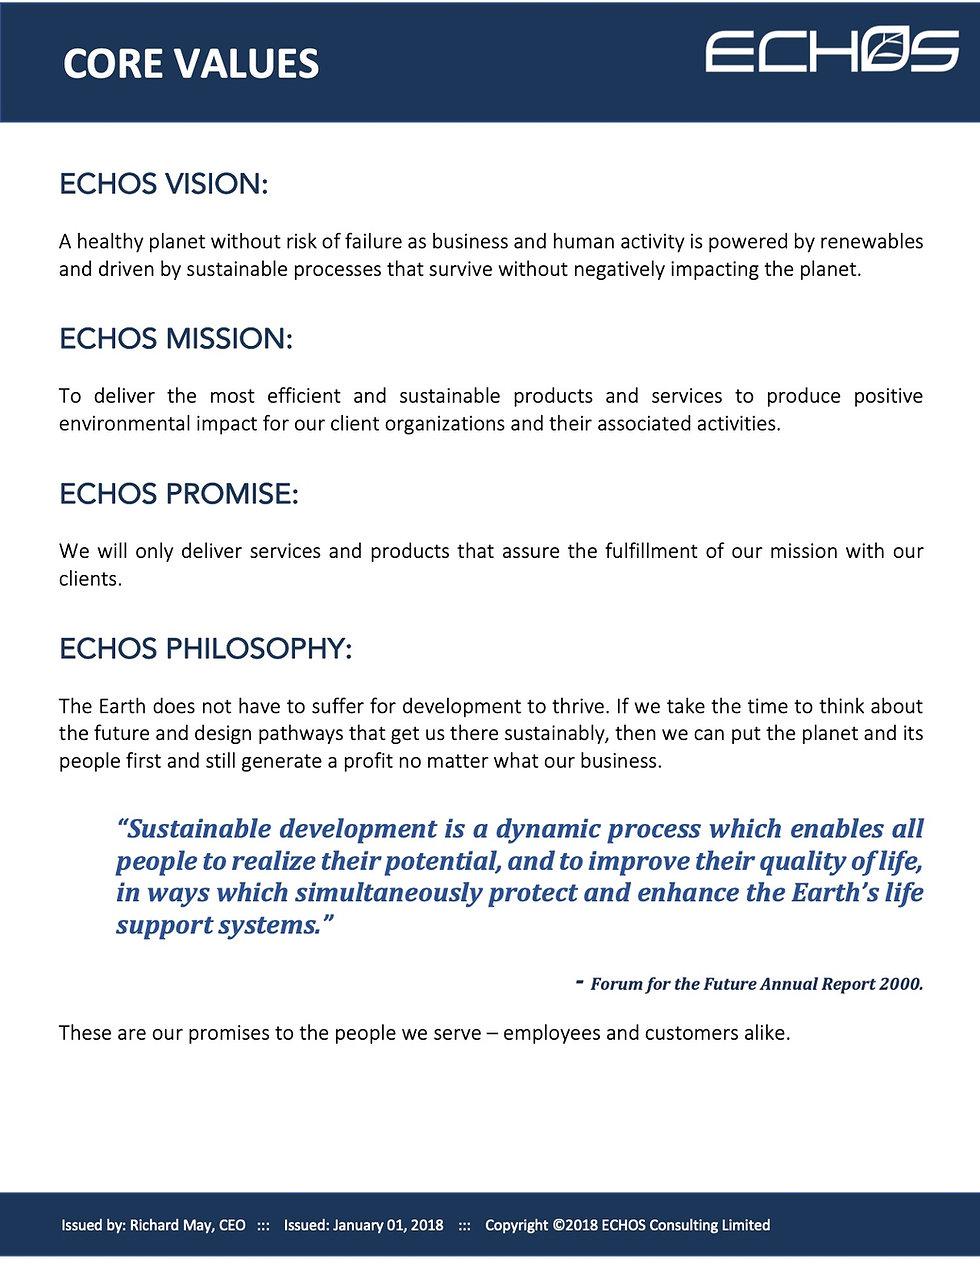 ECHOS Core Values.jpg